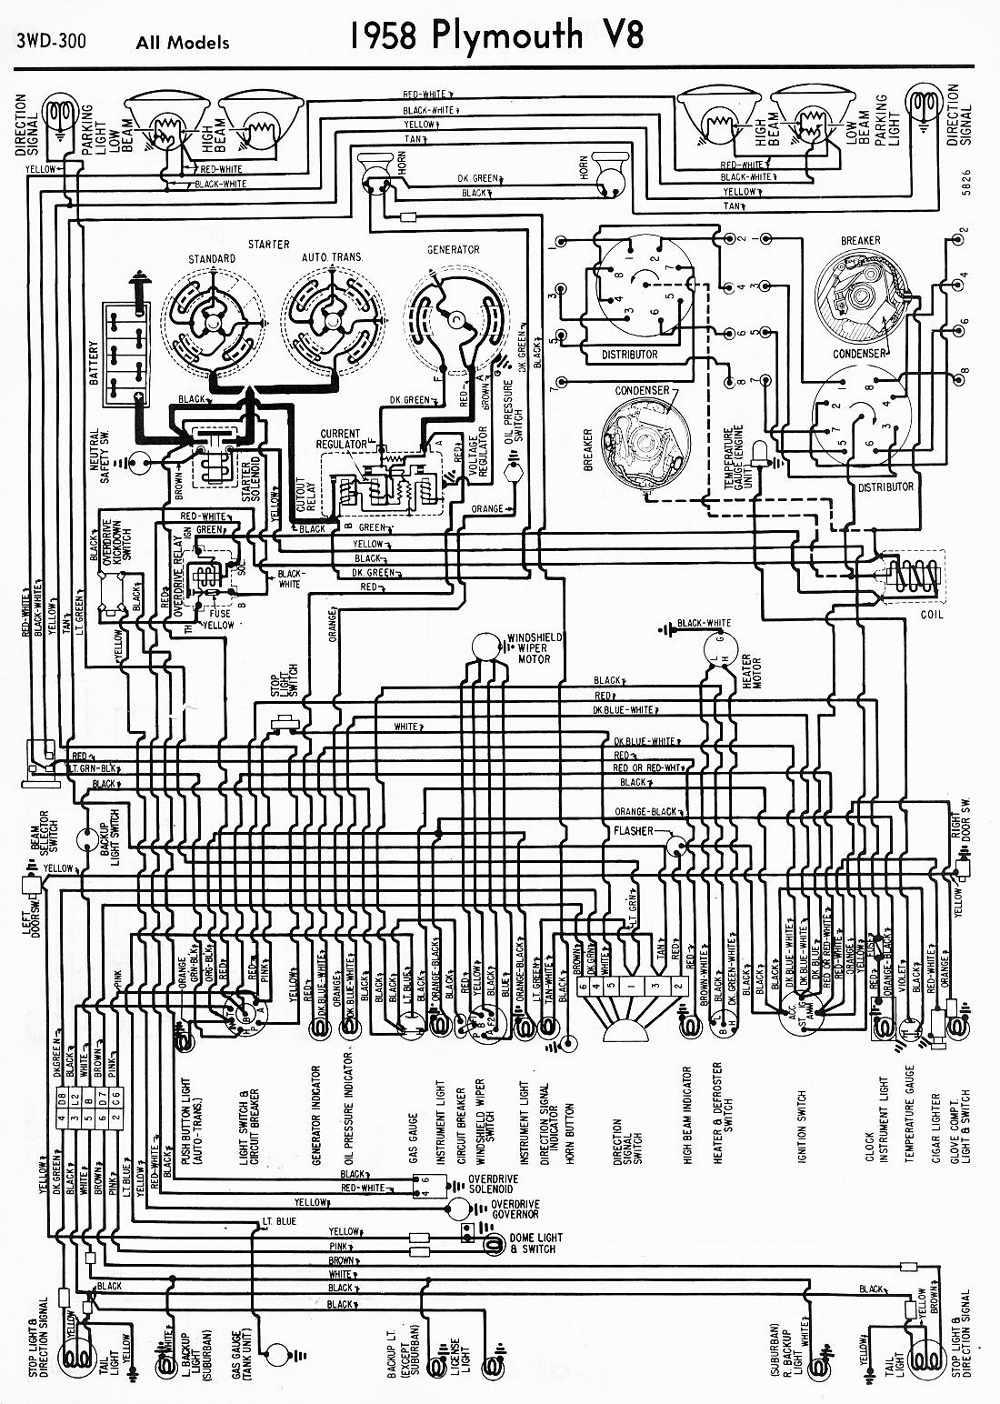 1958 Plymouth Wiring Diagram Trusted Diagrams 1939 Free Circuit Symbols Schematics U2022 Rh Seniorlivinguniversity Co Chevy 350 Starter